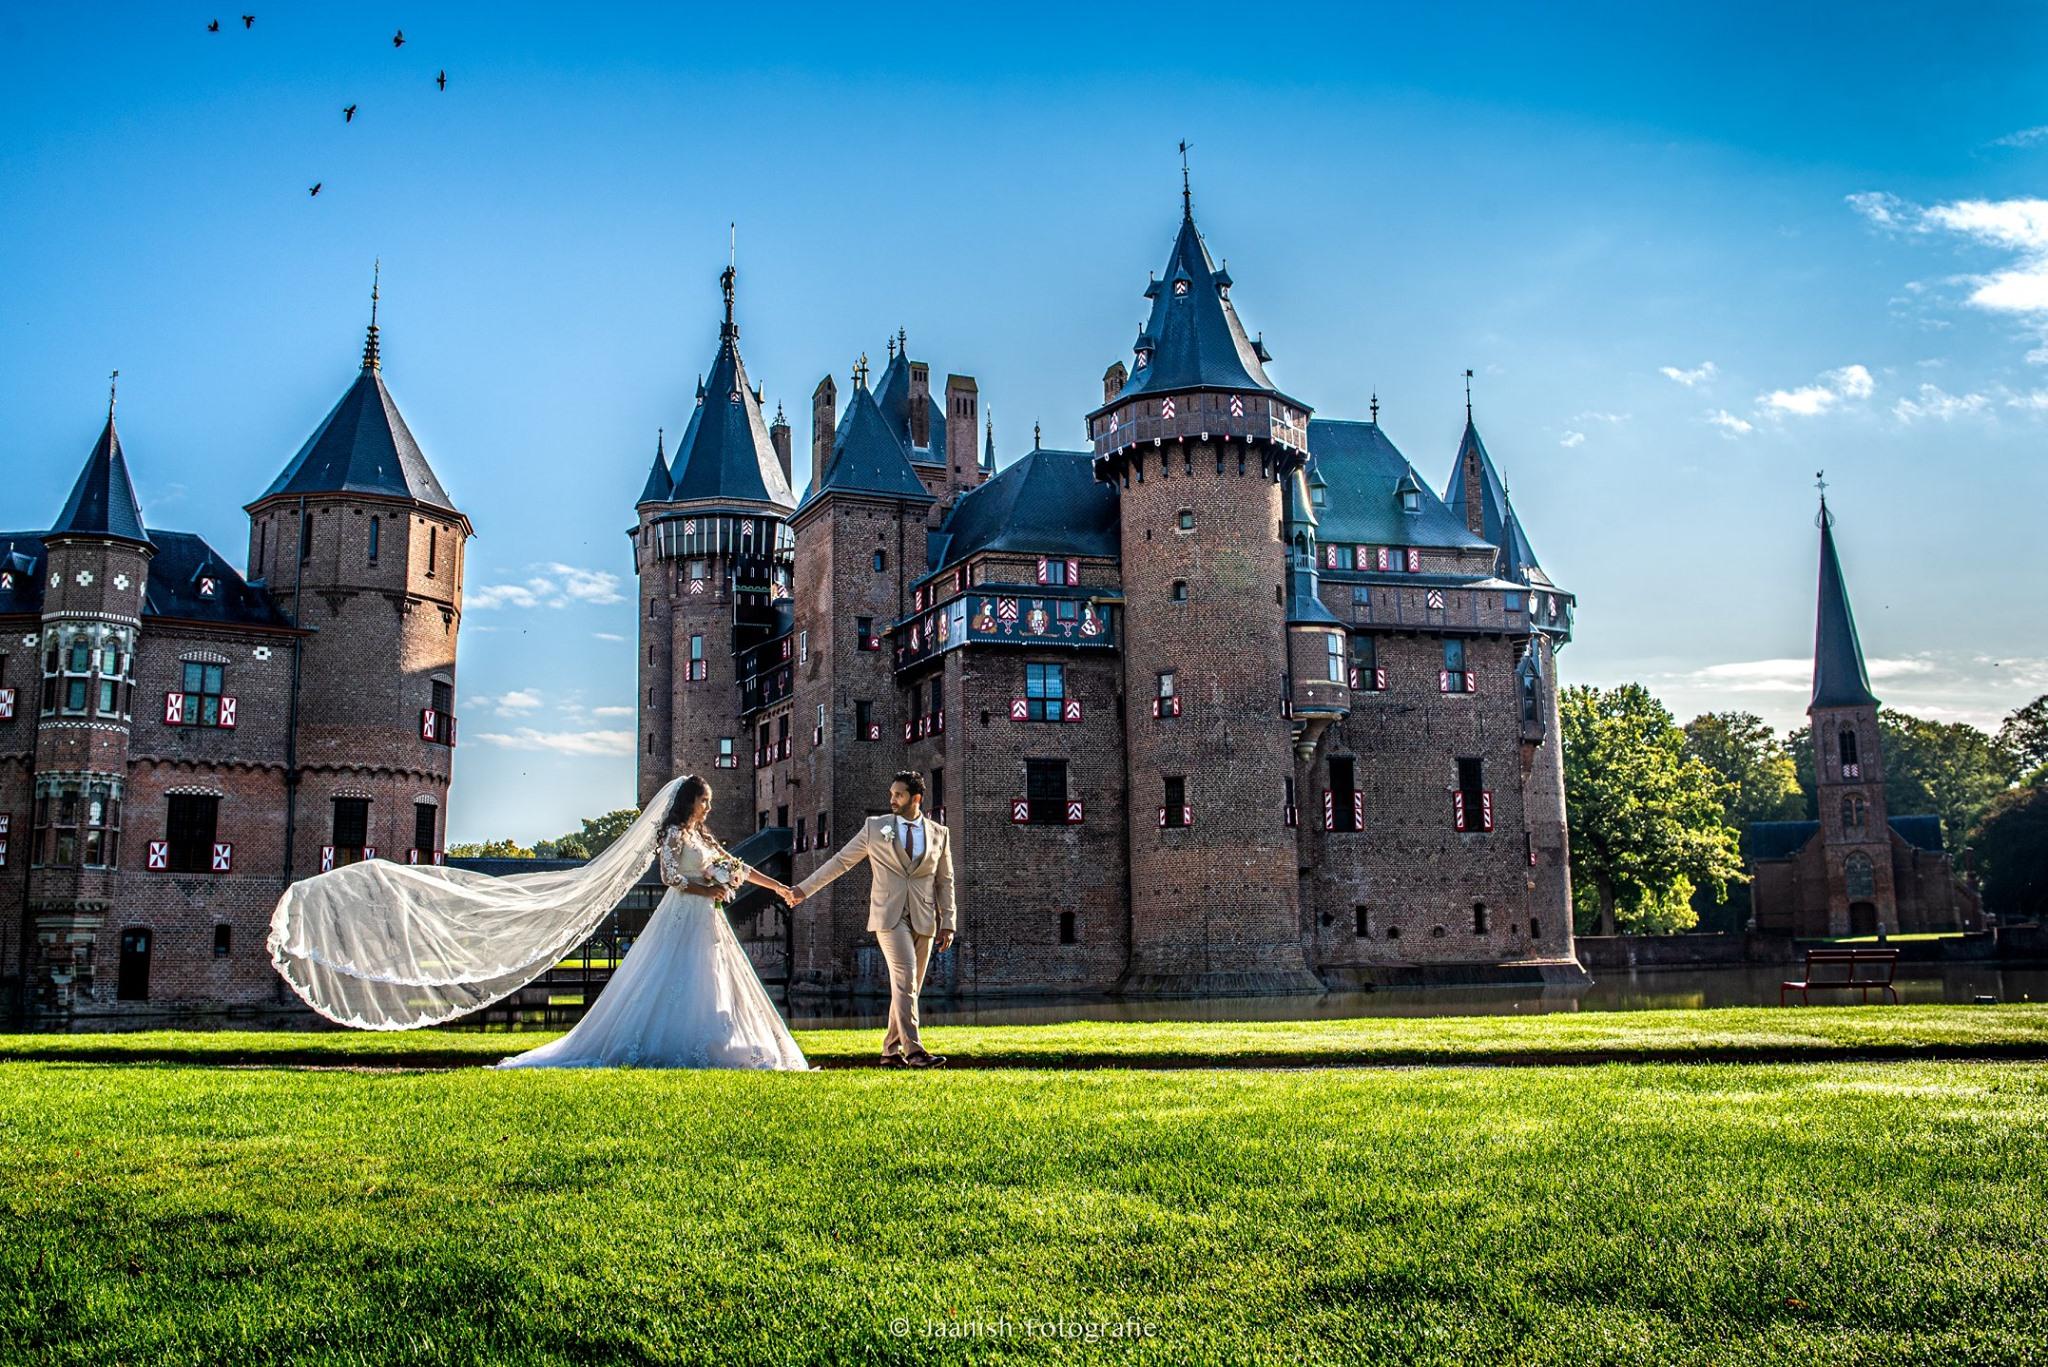 Bruiloft Fotoshoot in kasteel indian wedding photography 6